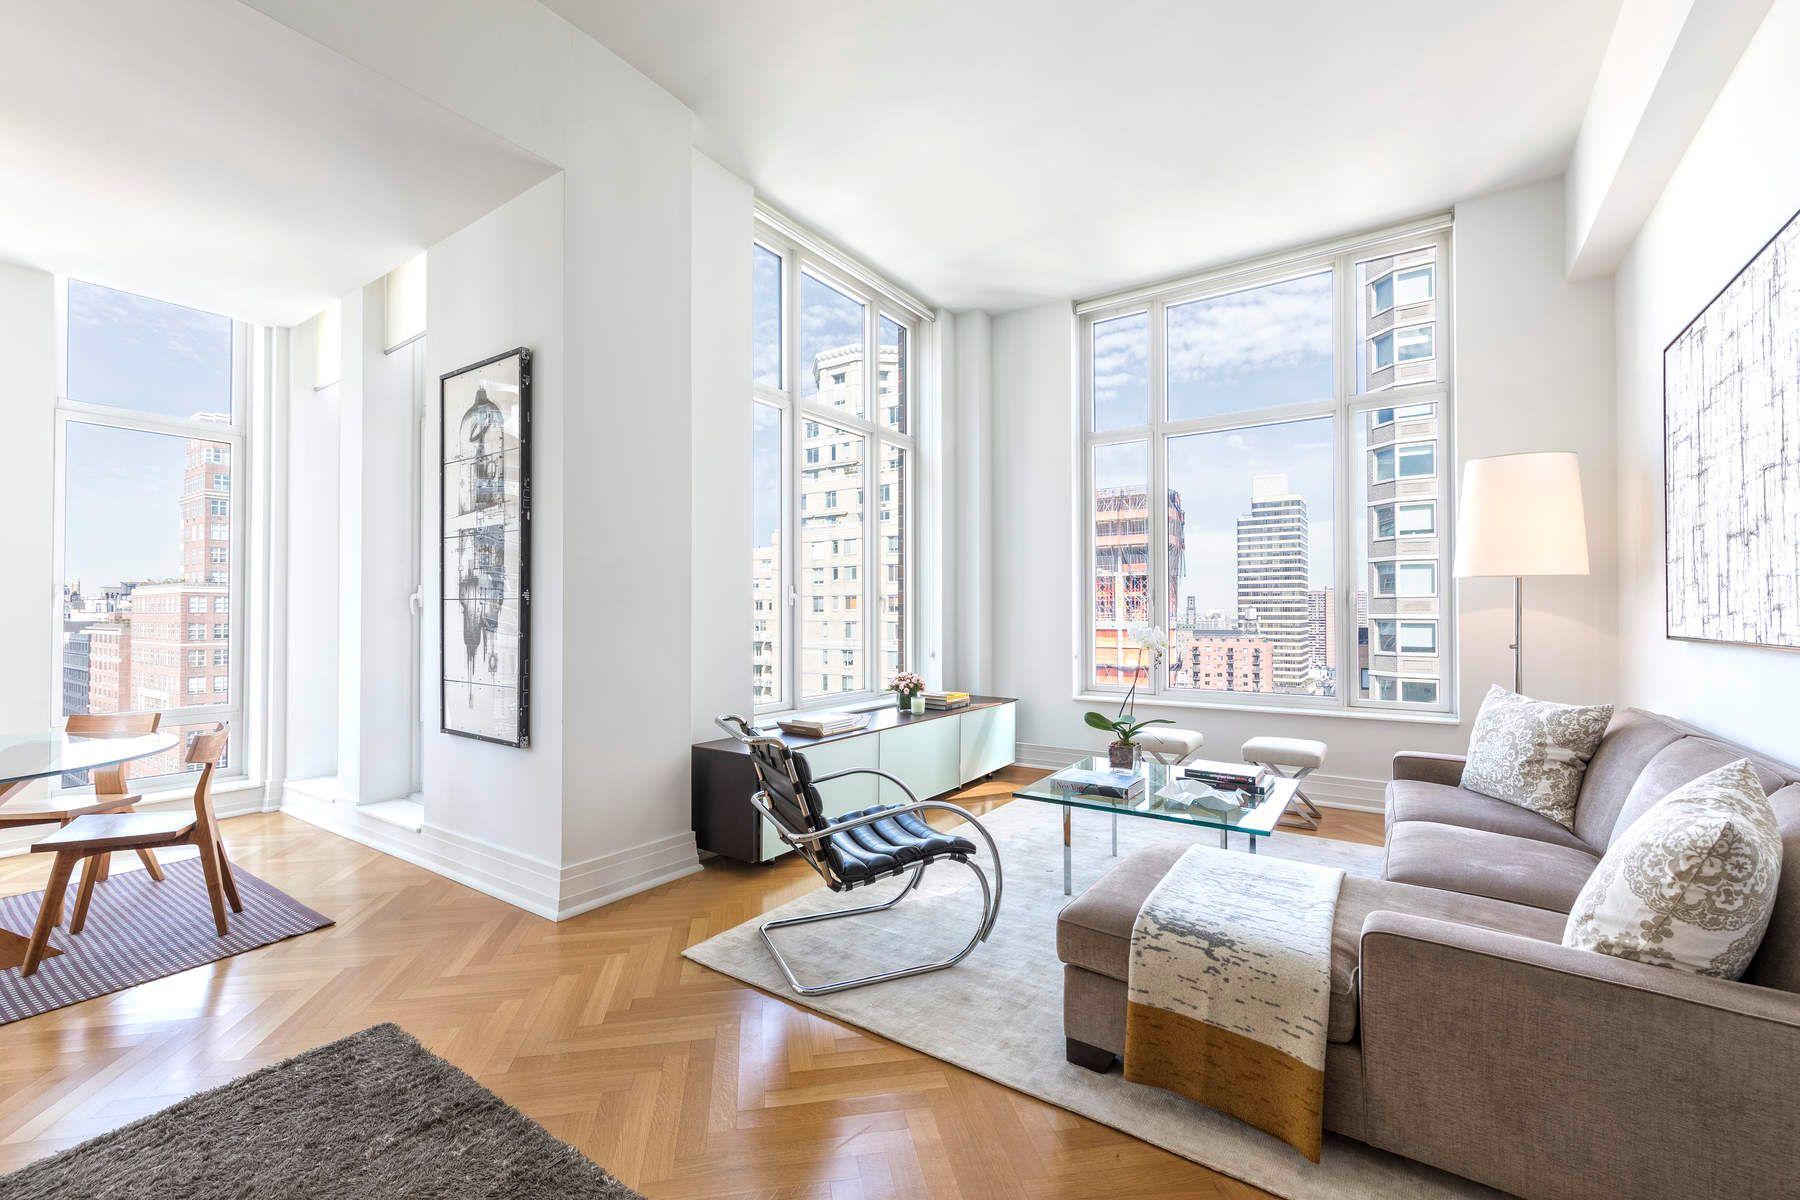 Condominium for Sale at 205 East 85th Street, Apt. 20D 205 East 85th Street Apt 20D, Upper East Side, New York, New York, 10028 United States